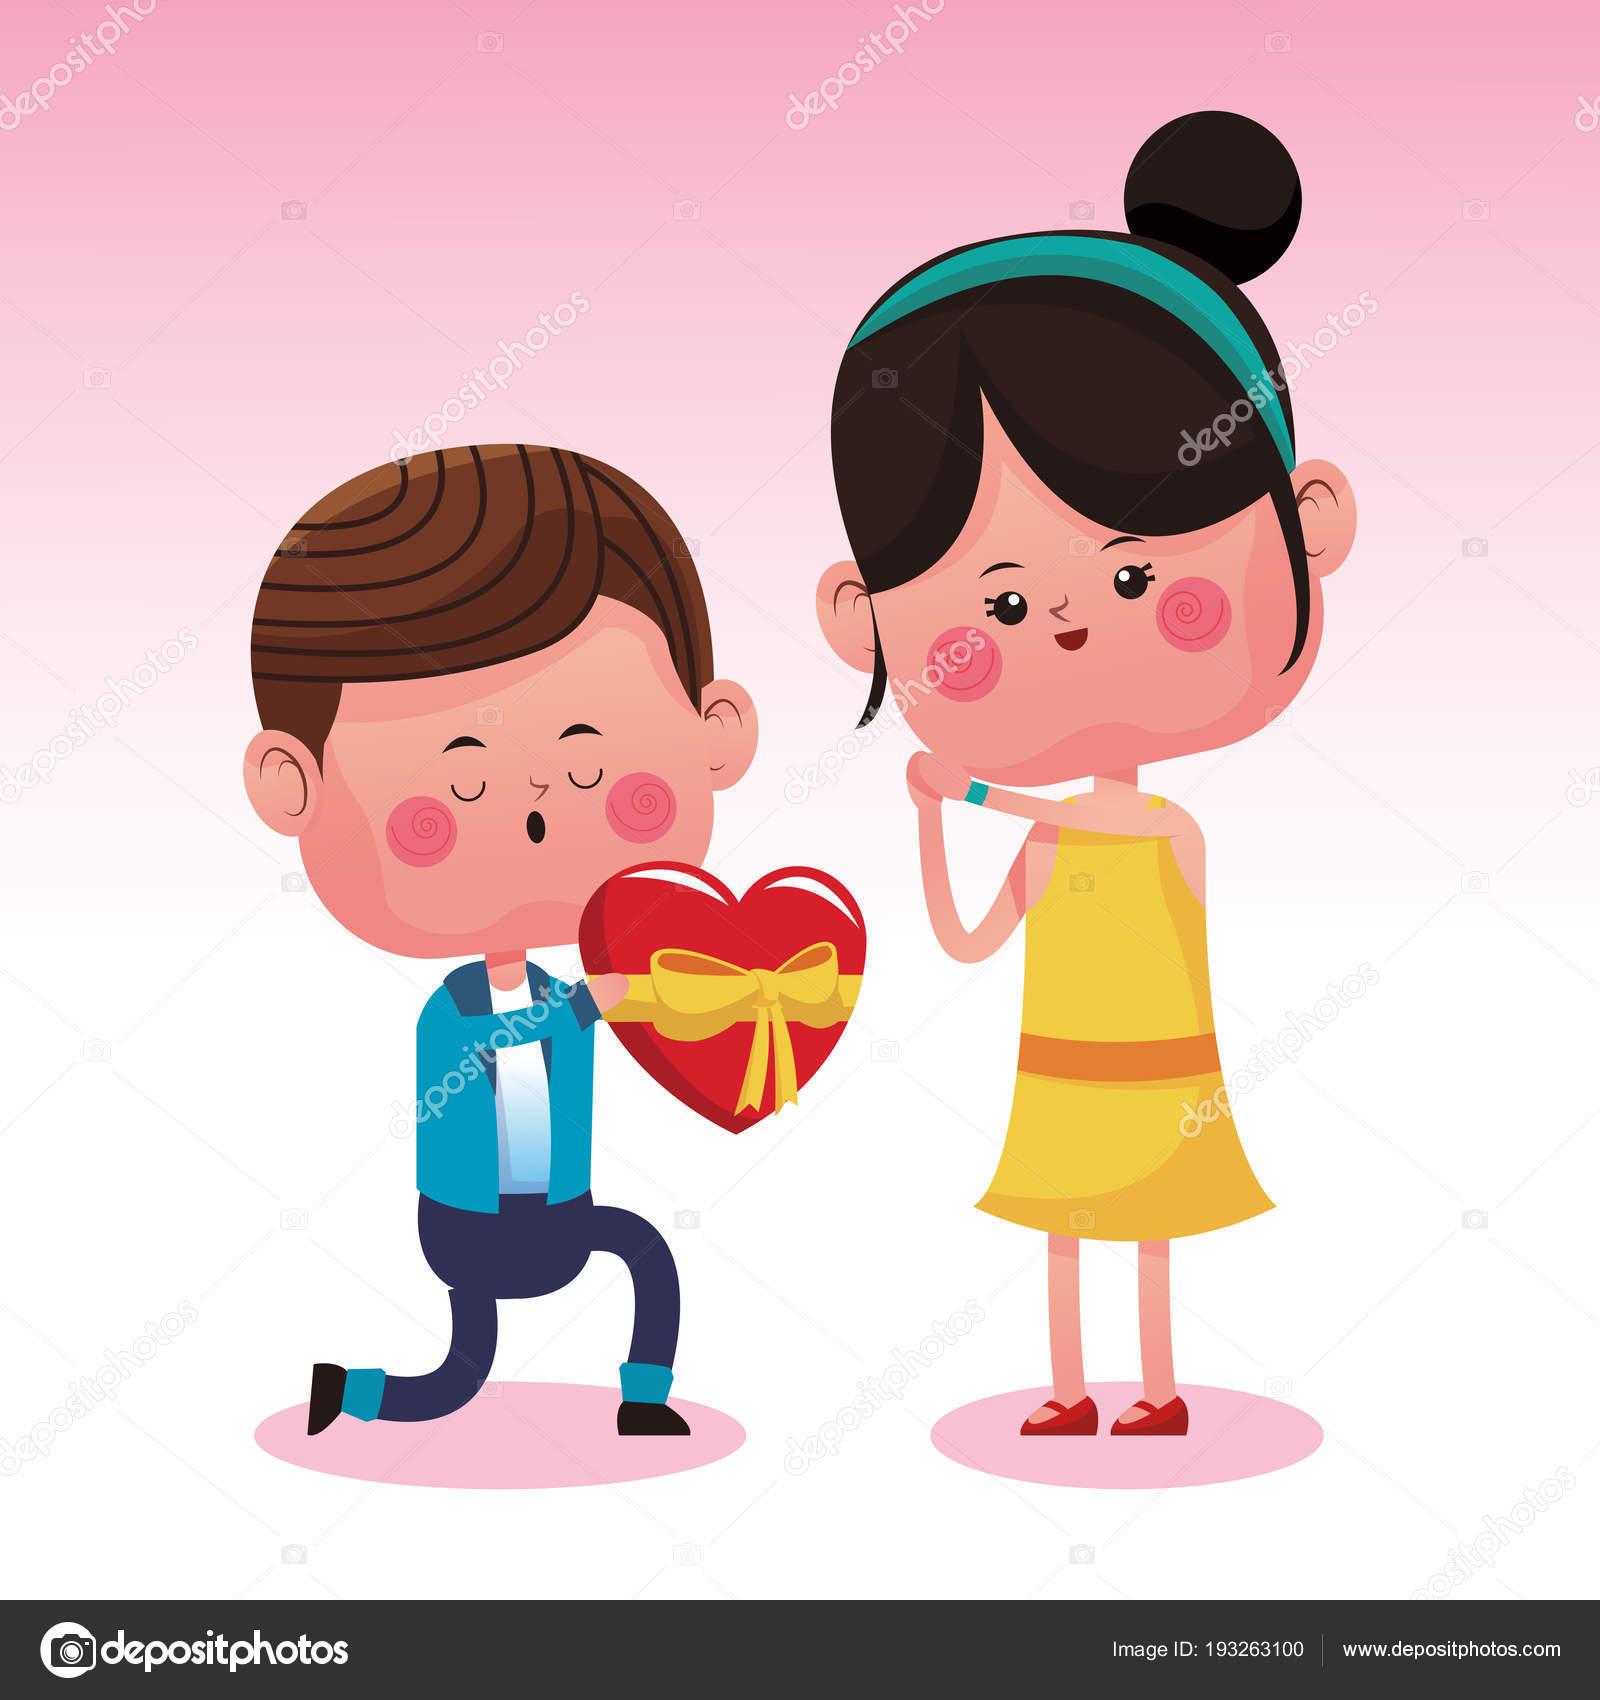 Cute Couple In Love Cartoons Stock Vector C Jemastock 193263100